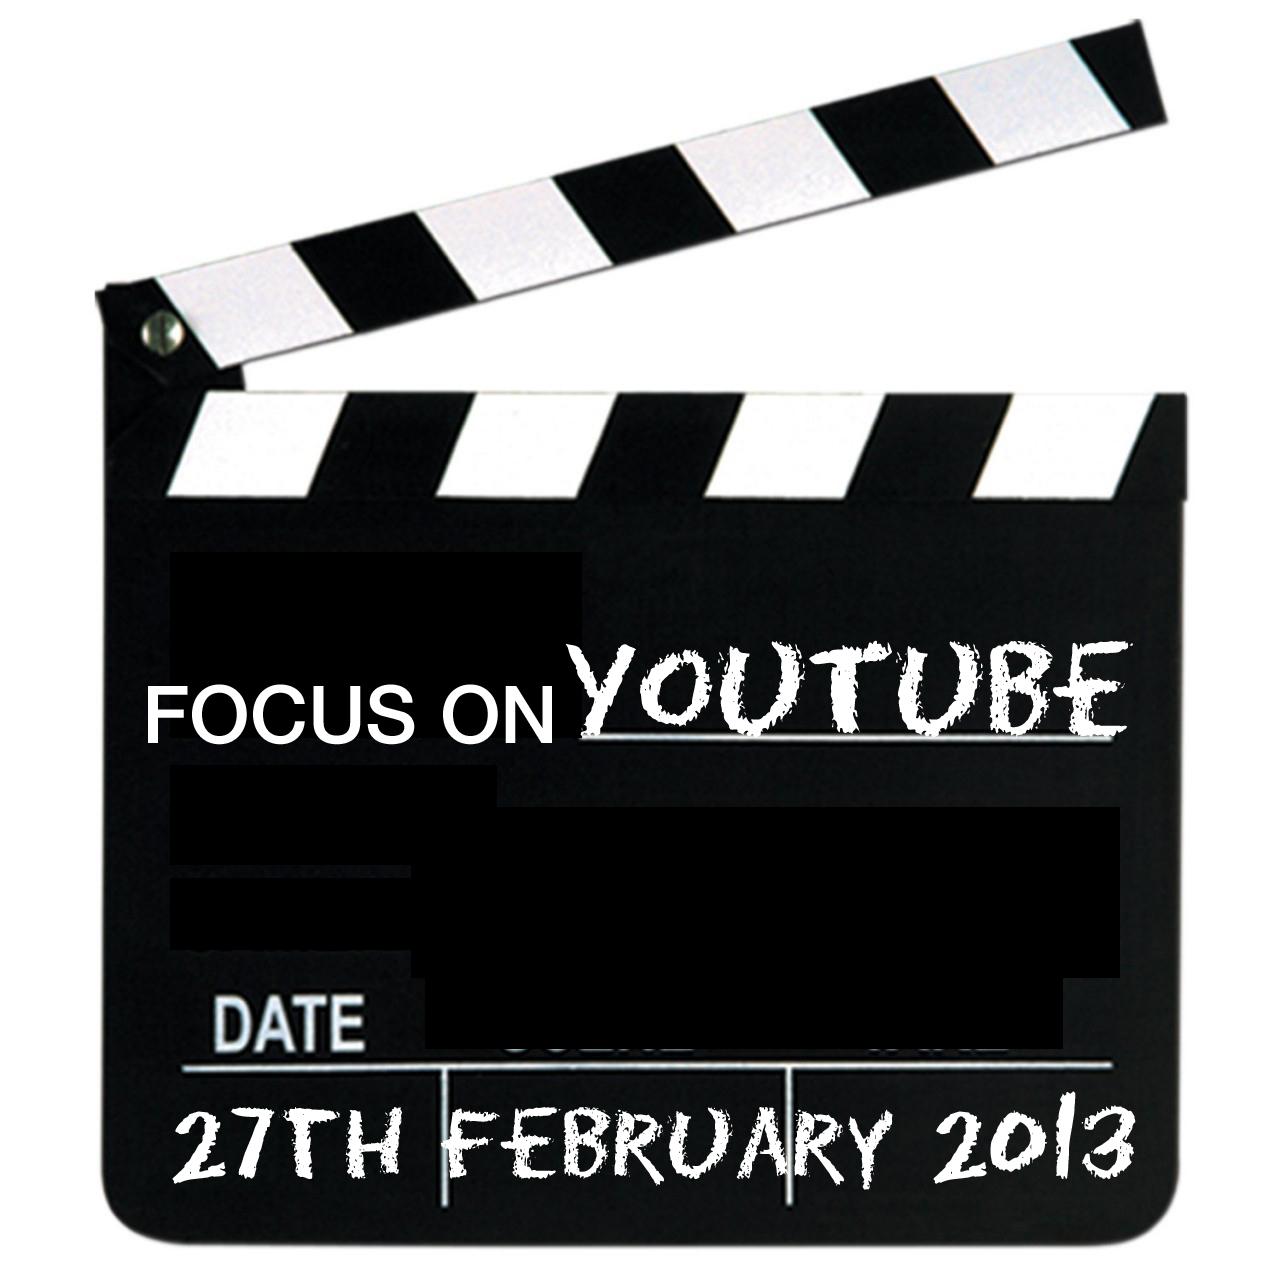 focus-youtube_glasgow-chamber.jpeg